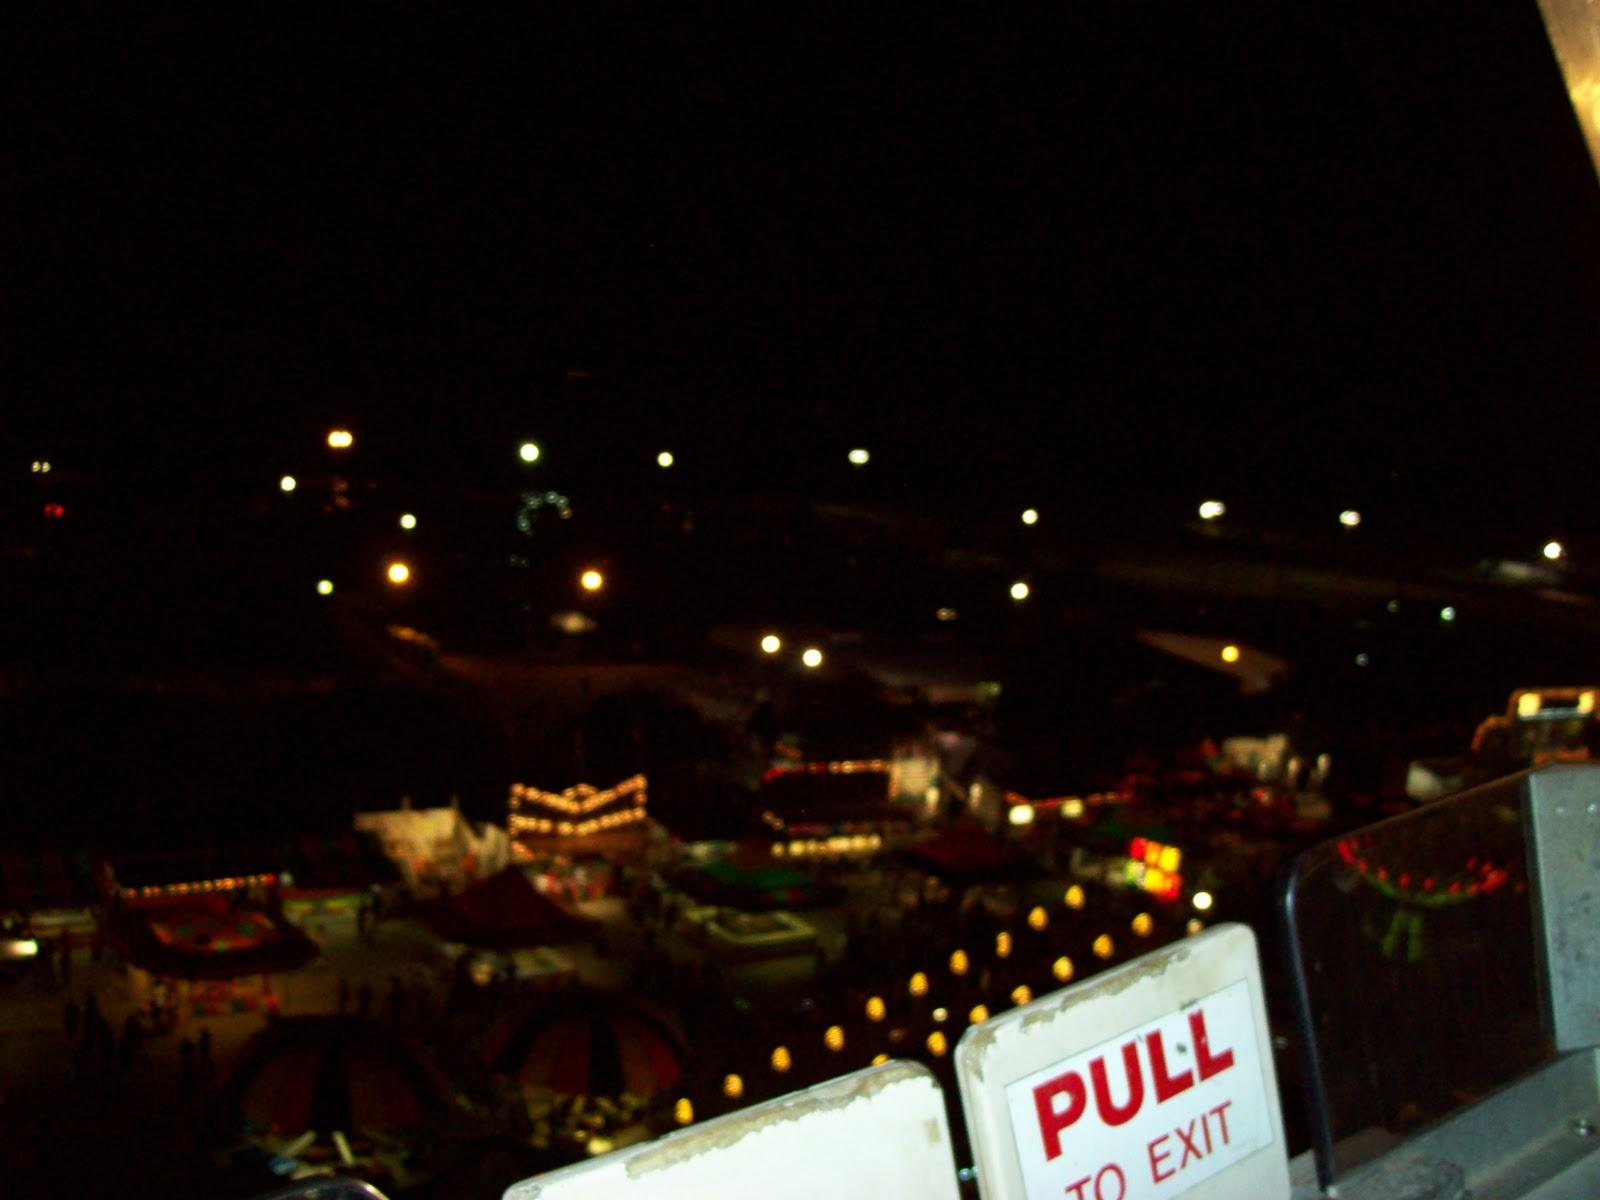 Fort Bend County Fair - 101_5448.JPG